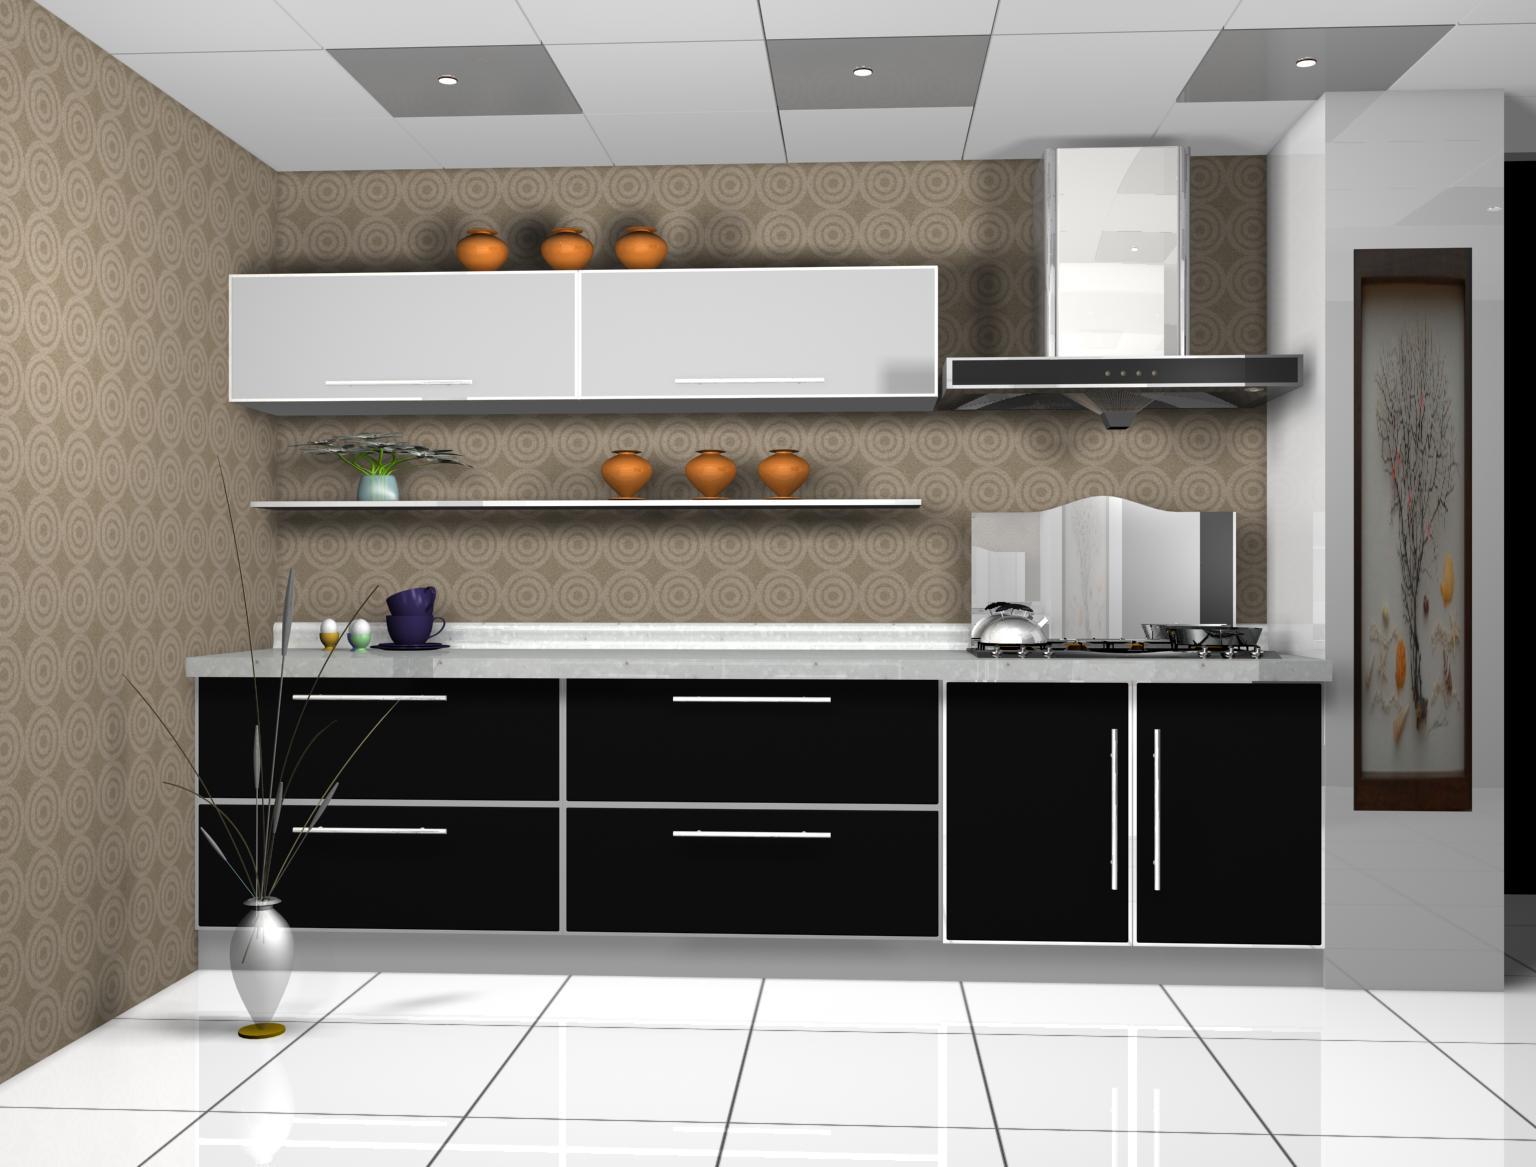 Tu casa divina agosto 2013 for Estilos de gabinetes de cocina